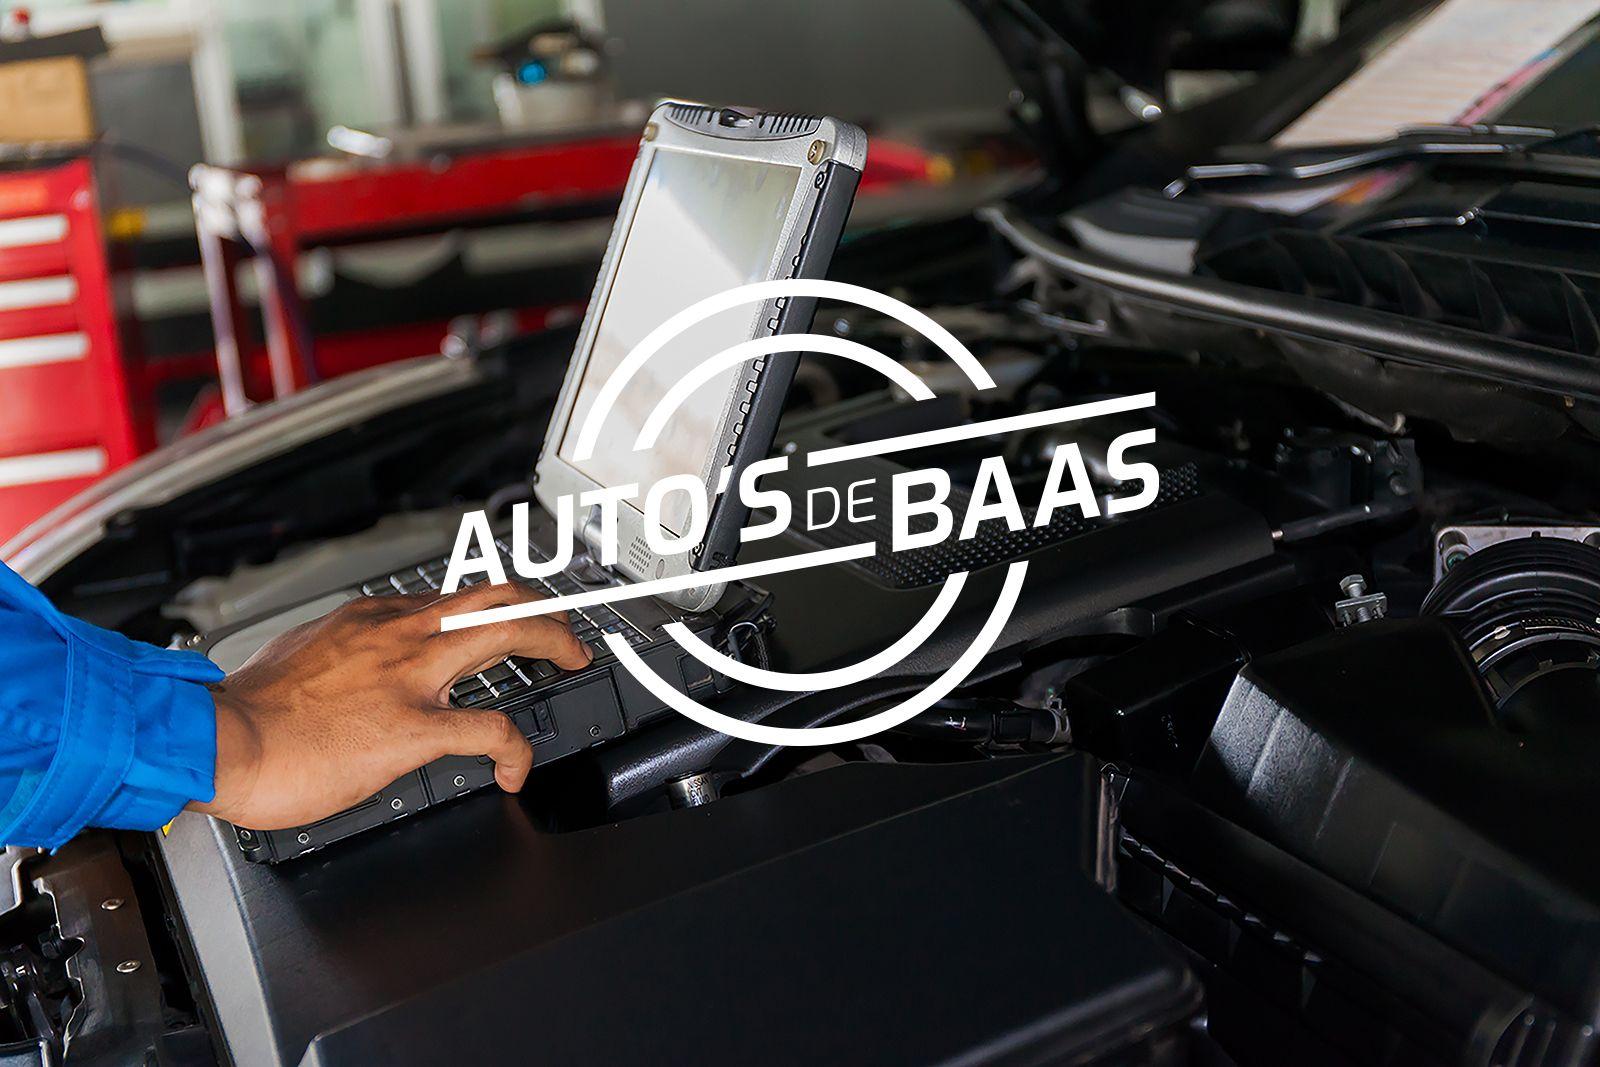 Pass-Thru Auto's de Baas